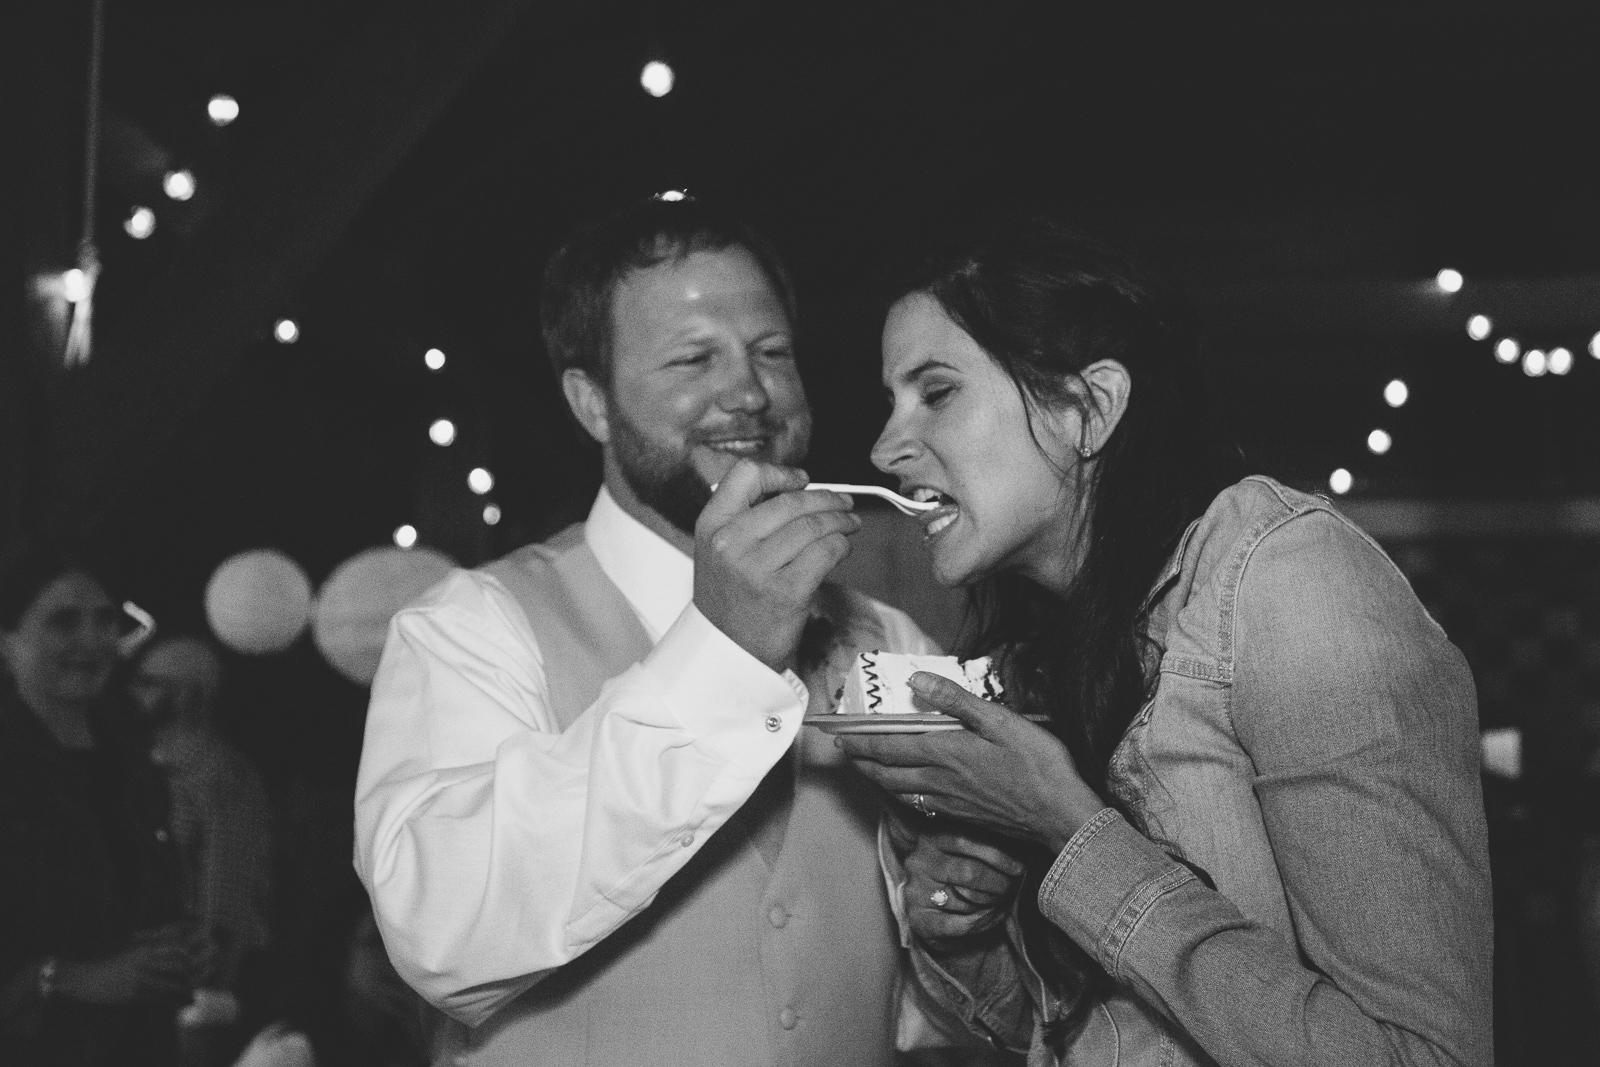 186-wedding-fun-photography-reception-unique-nature-trees-dancing